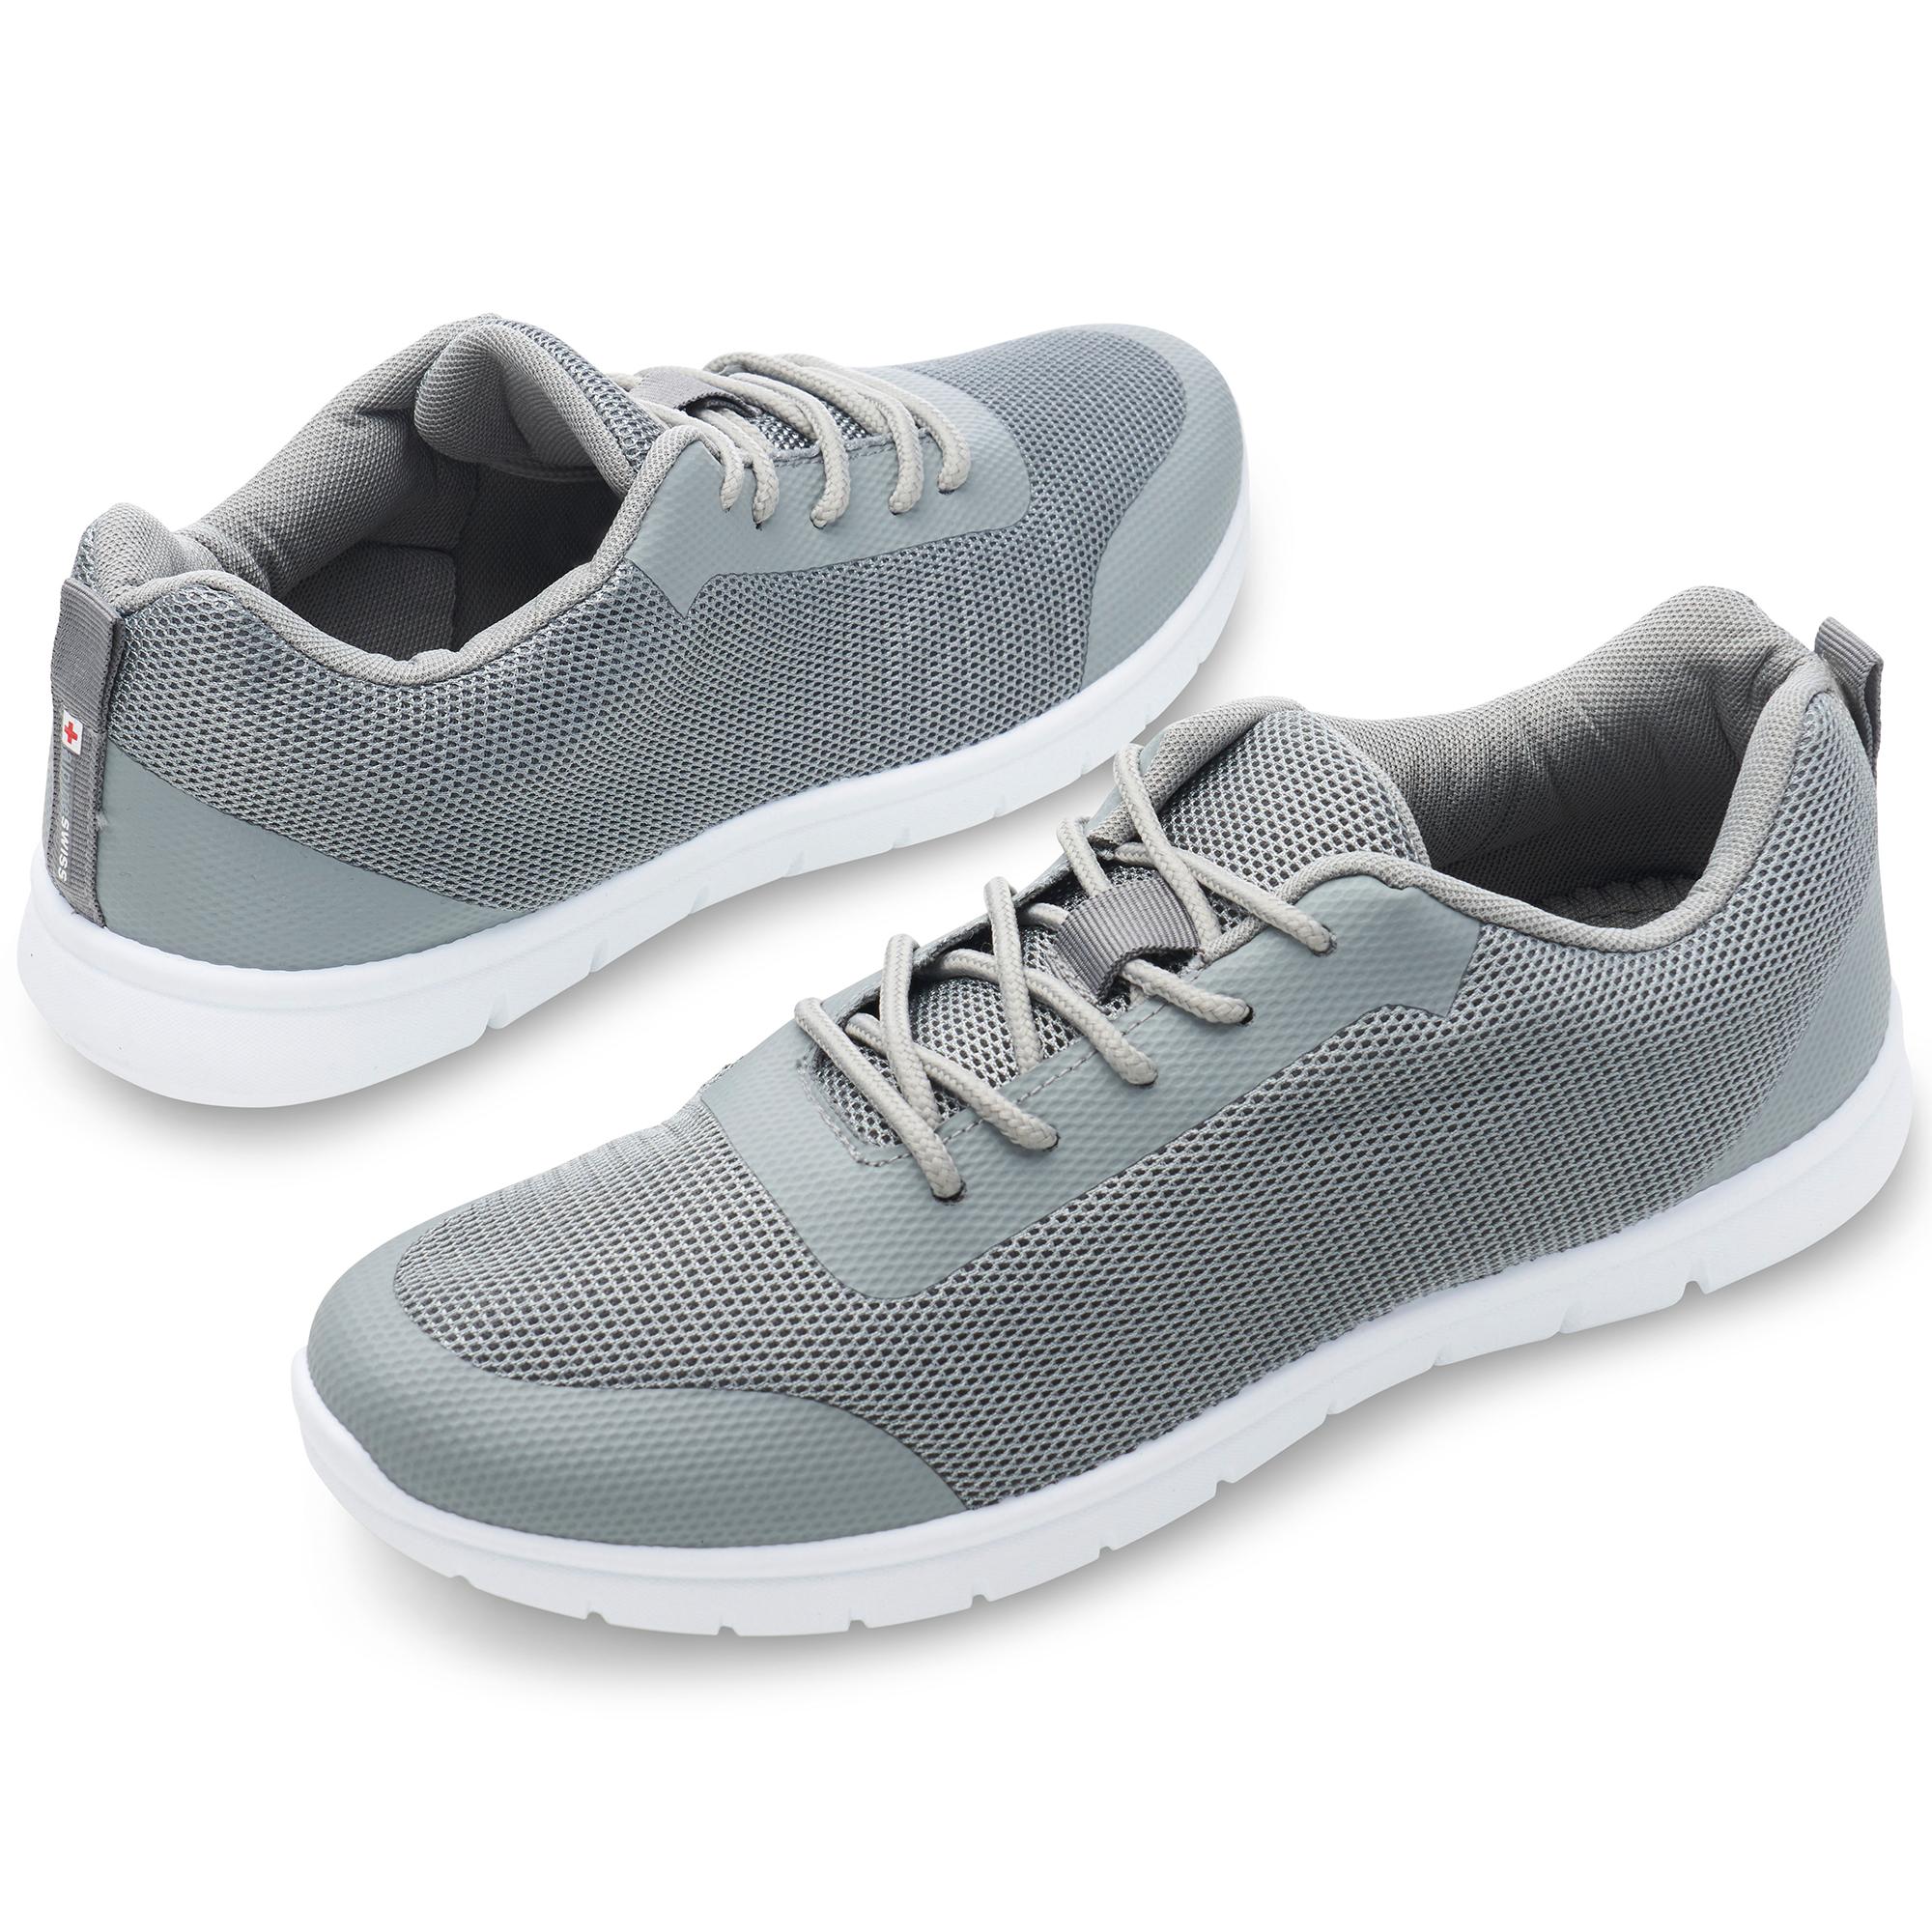 thumbnail 27 - Alpine Swiss Bolt Mesh Sneaker Casual Light Shoes For Men With Shoe Bag